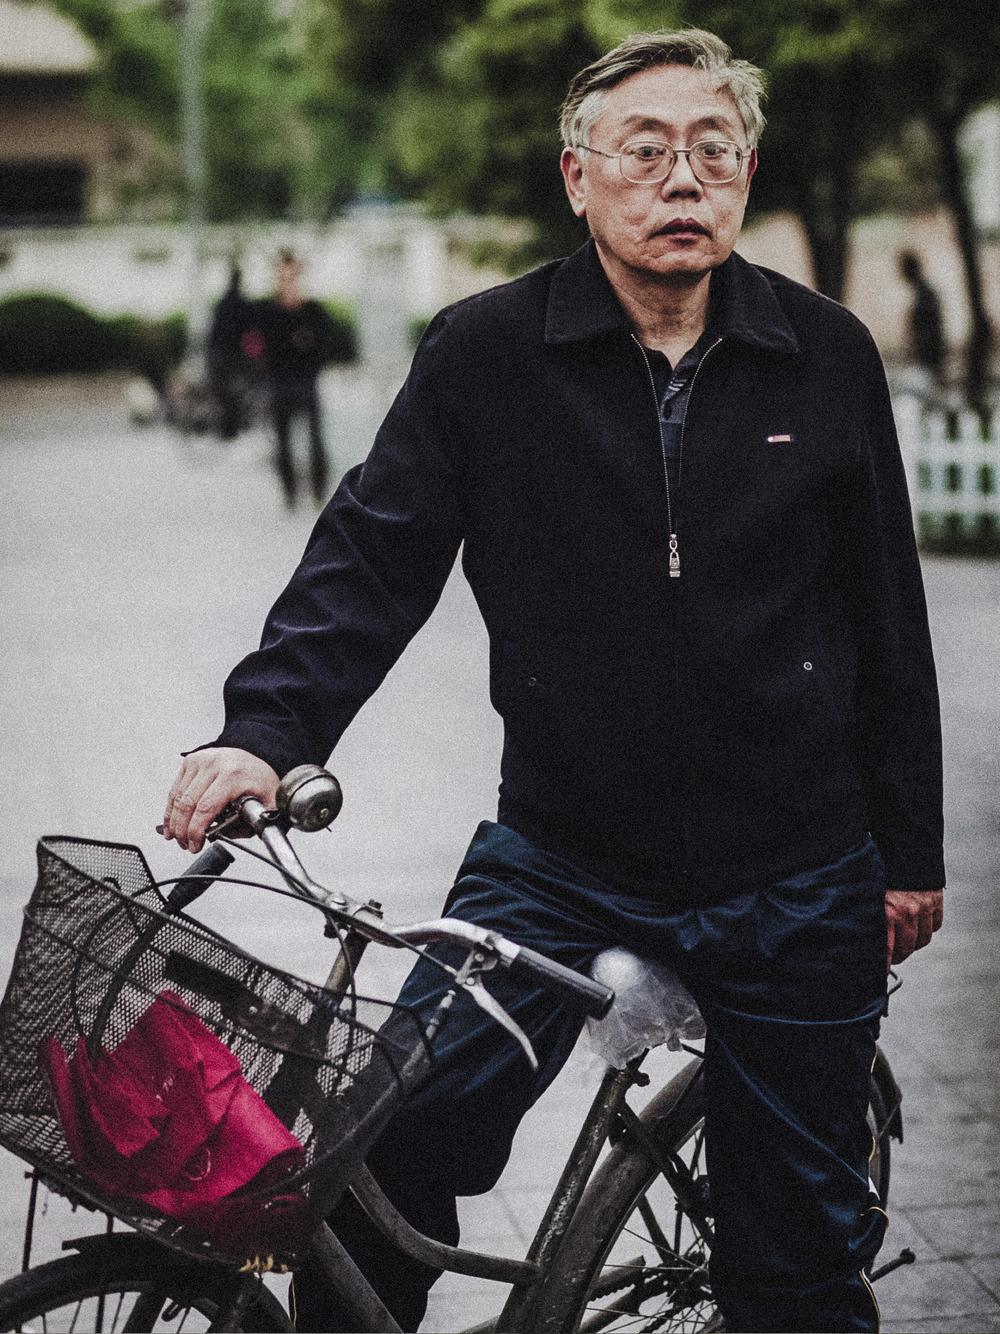 AndrewWhite_Shanghai-27.JPG